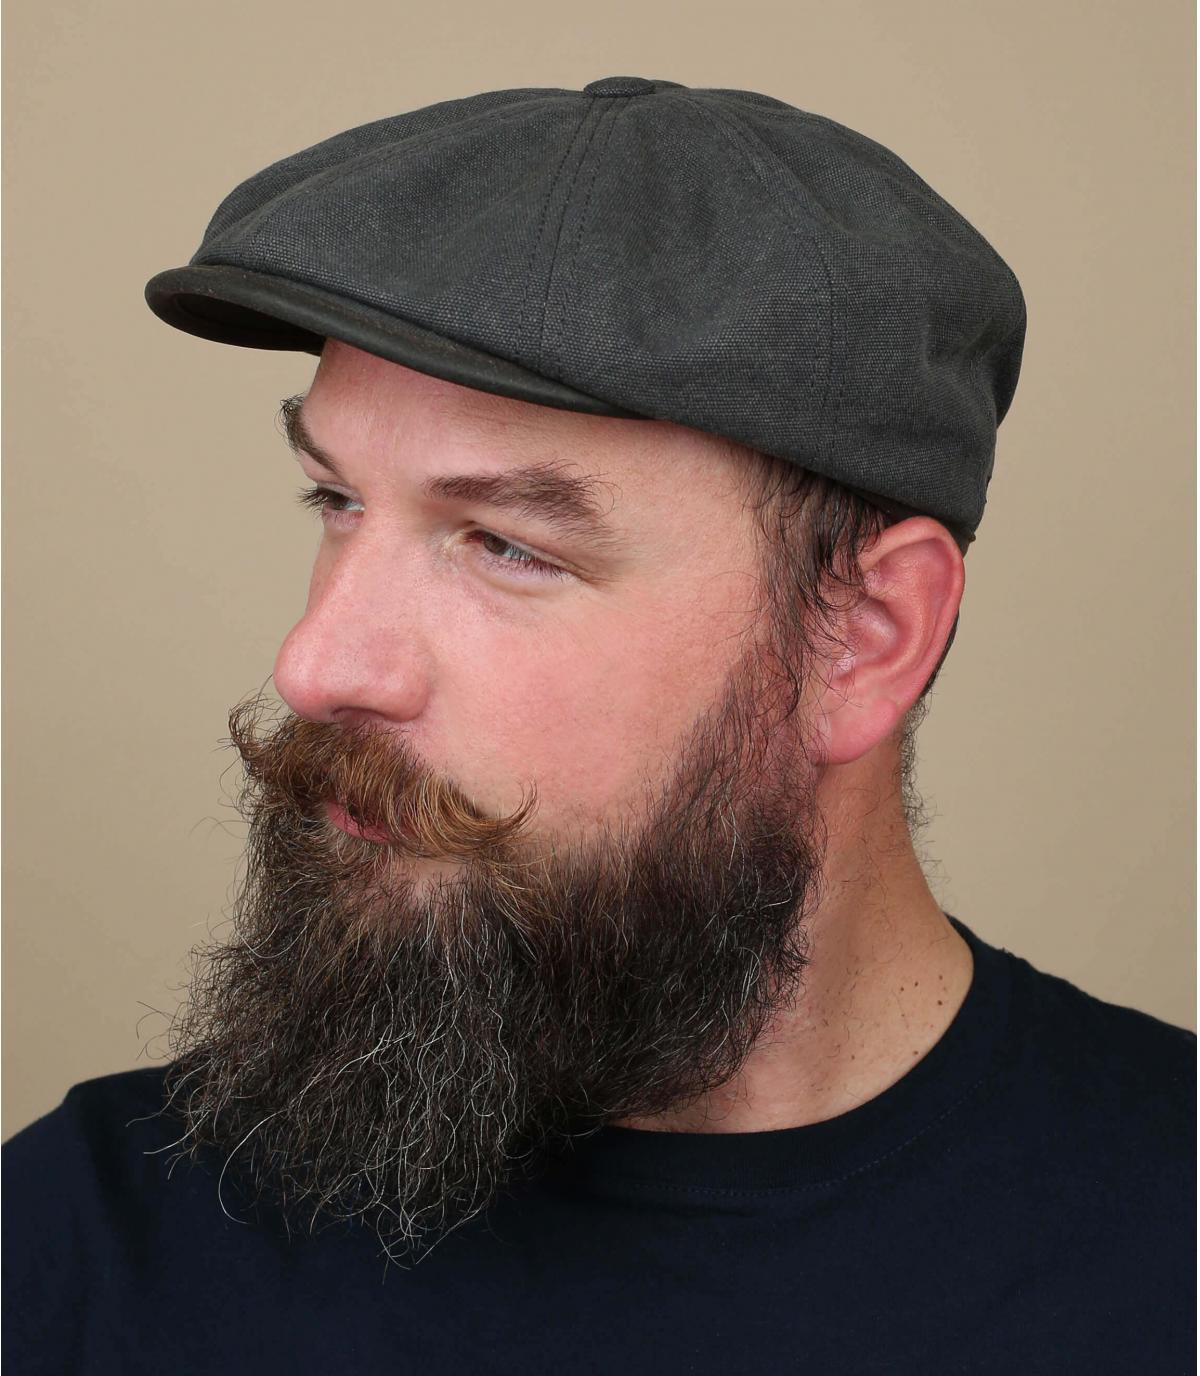 krantenverkoper cap zwart canvas